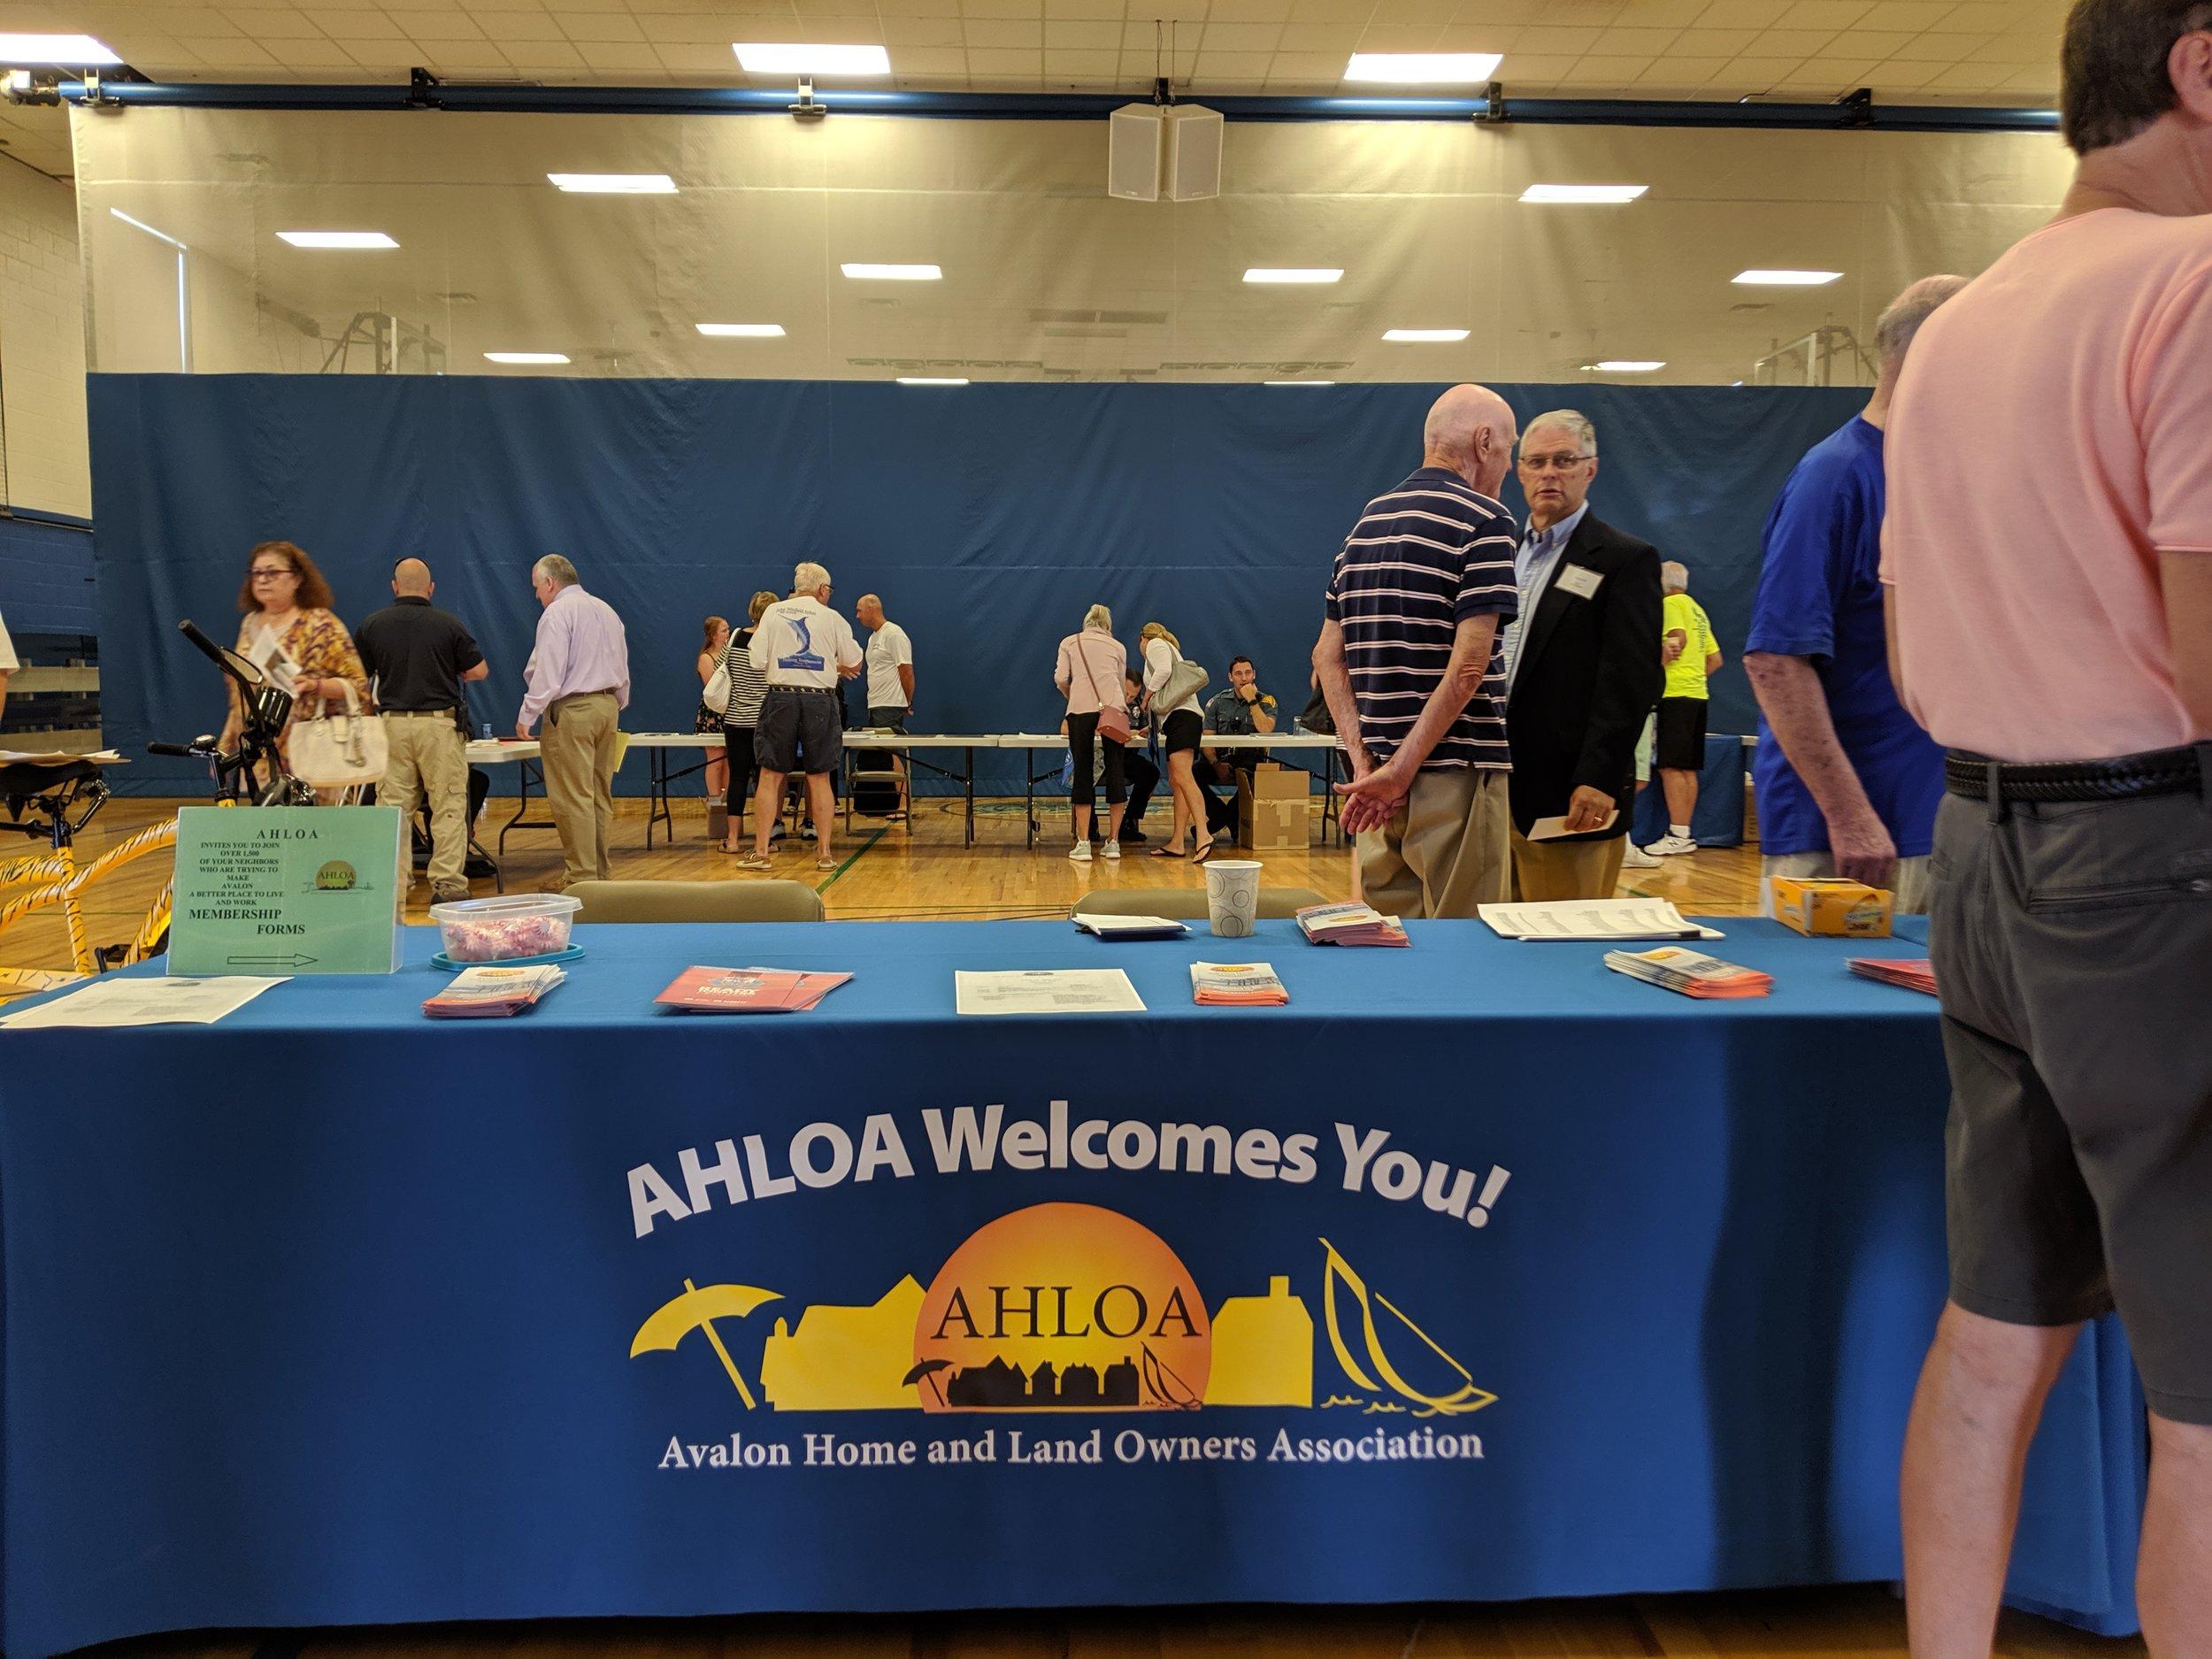 AHLOA Welcome Table